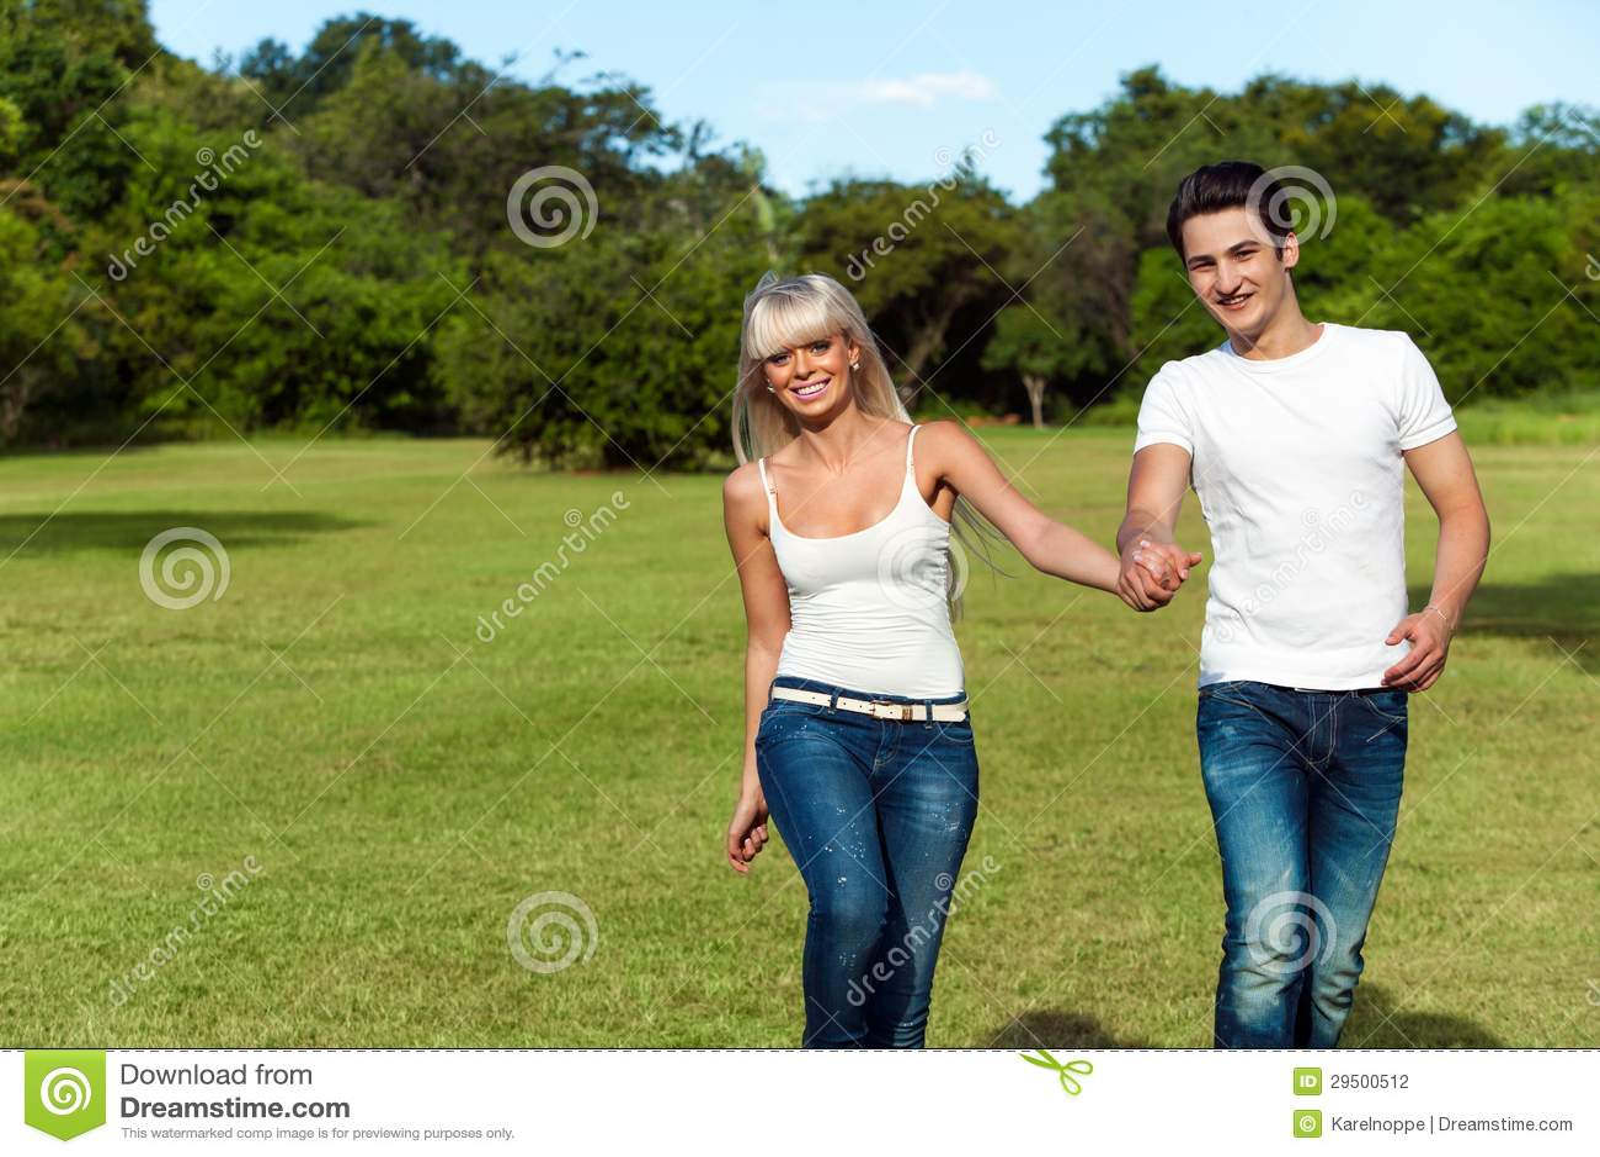 Jong paarhoppen samen in park.